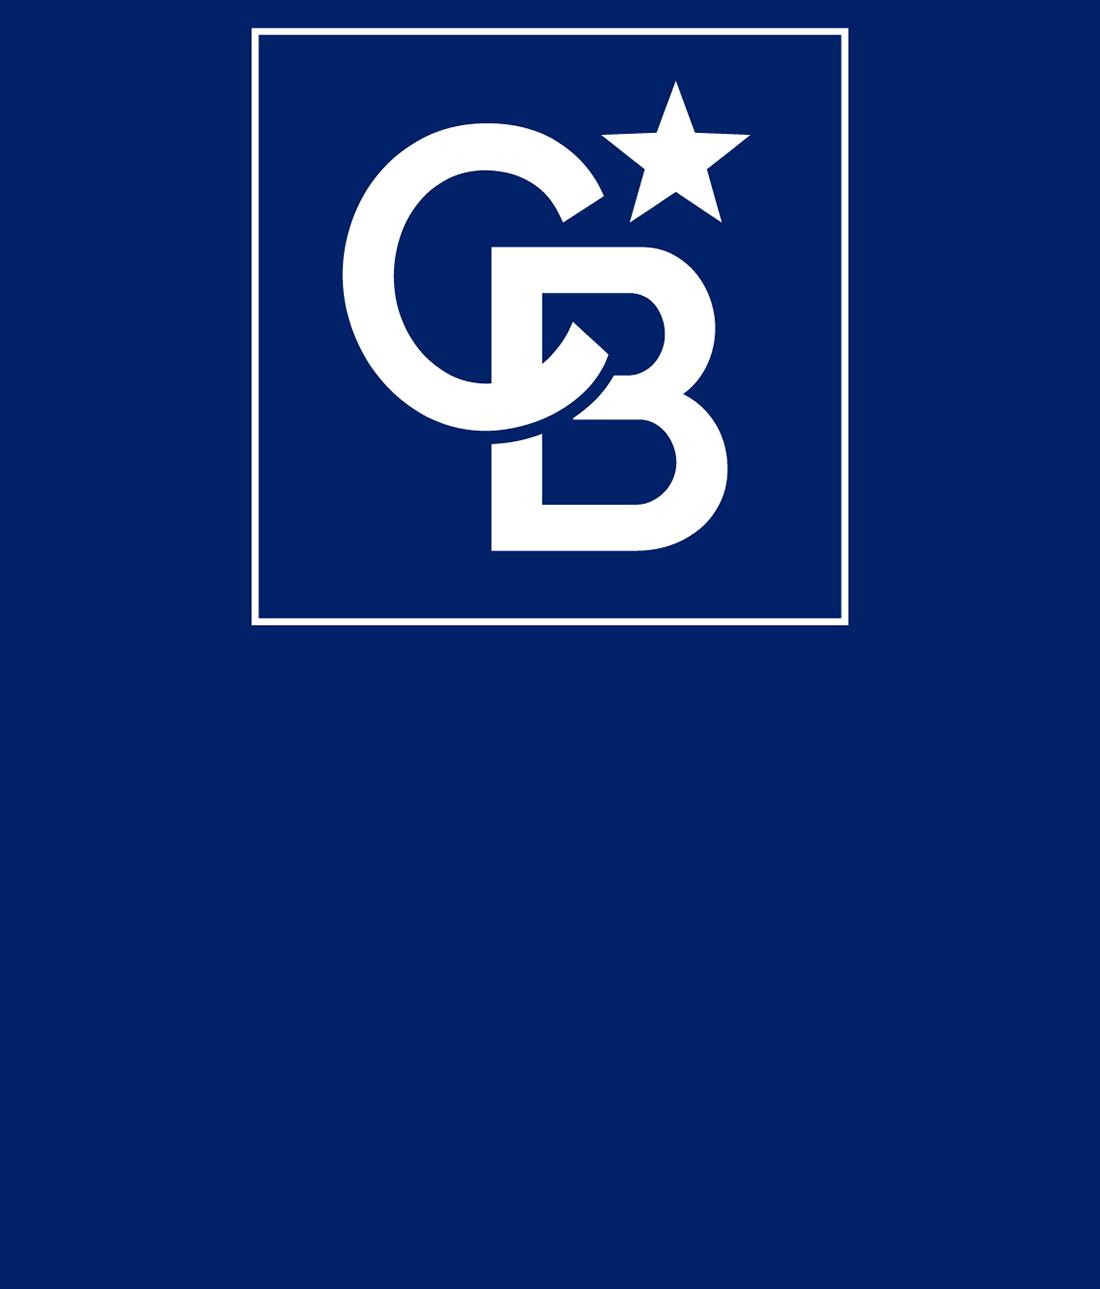 cbhs06 Logo